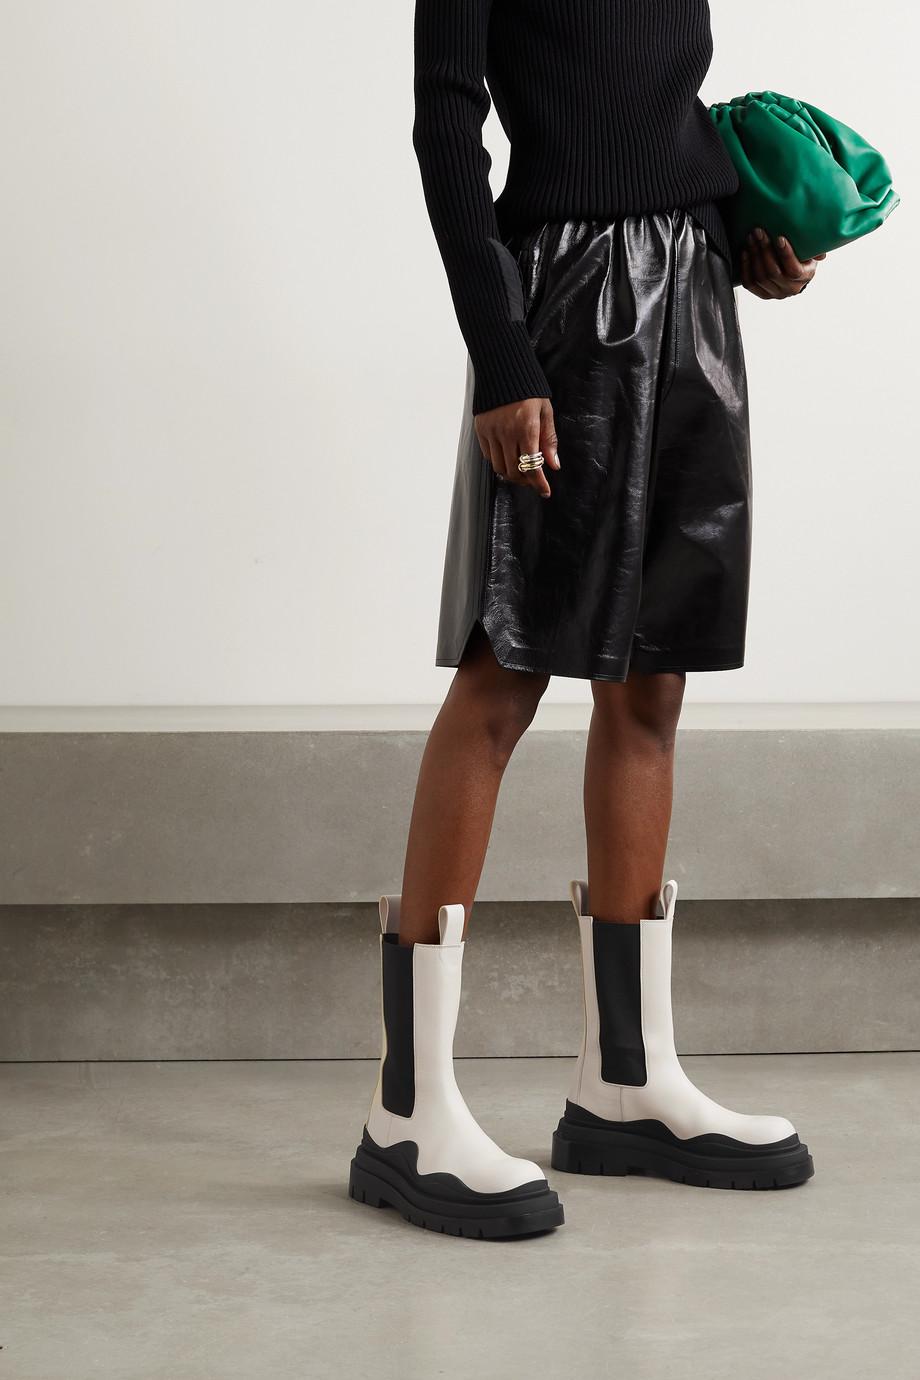 Bottega Veneta Tire Chelsea Boots aus Leder mit Gummibesatz